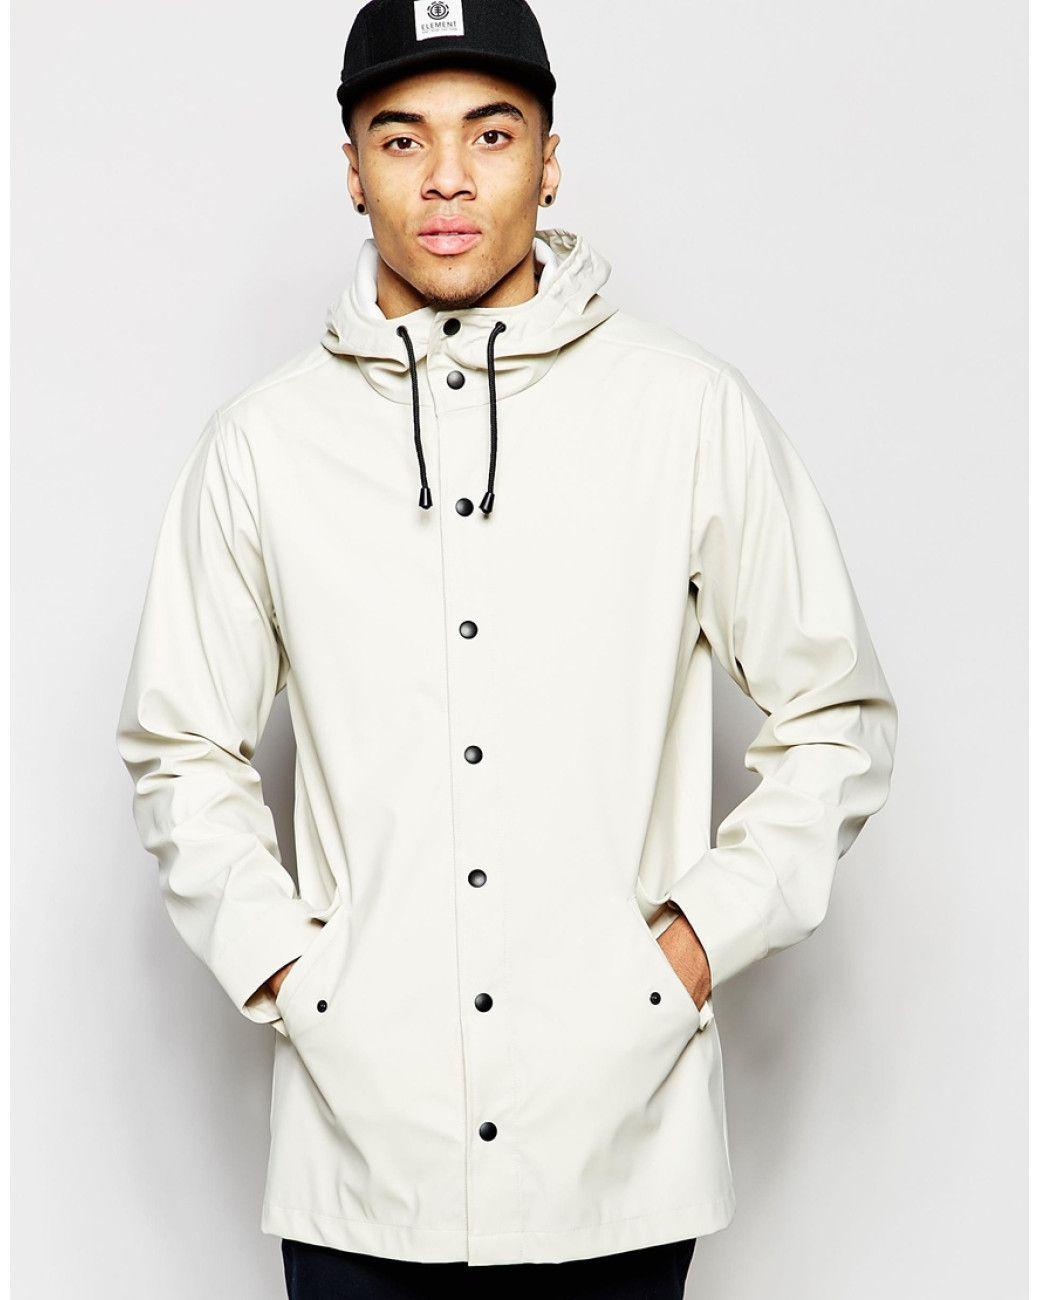 febe7571b3 Men s White Rain Coat With Shower Resistance In Stone